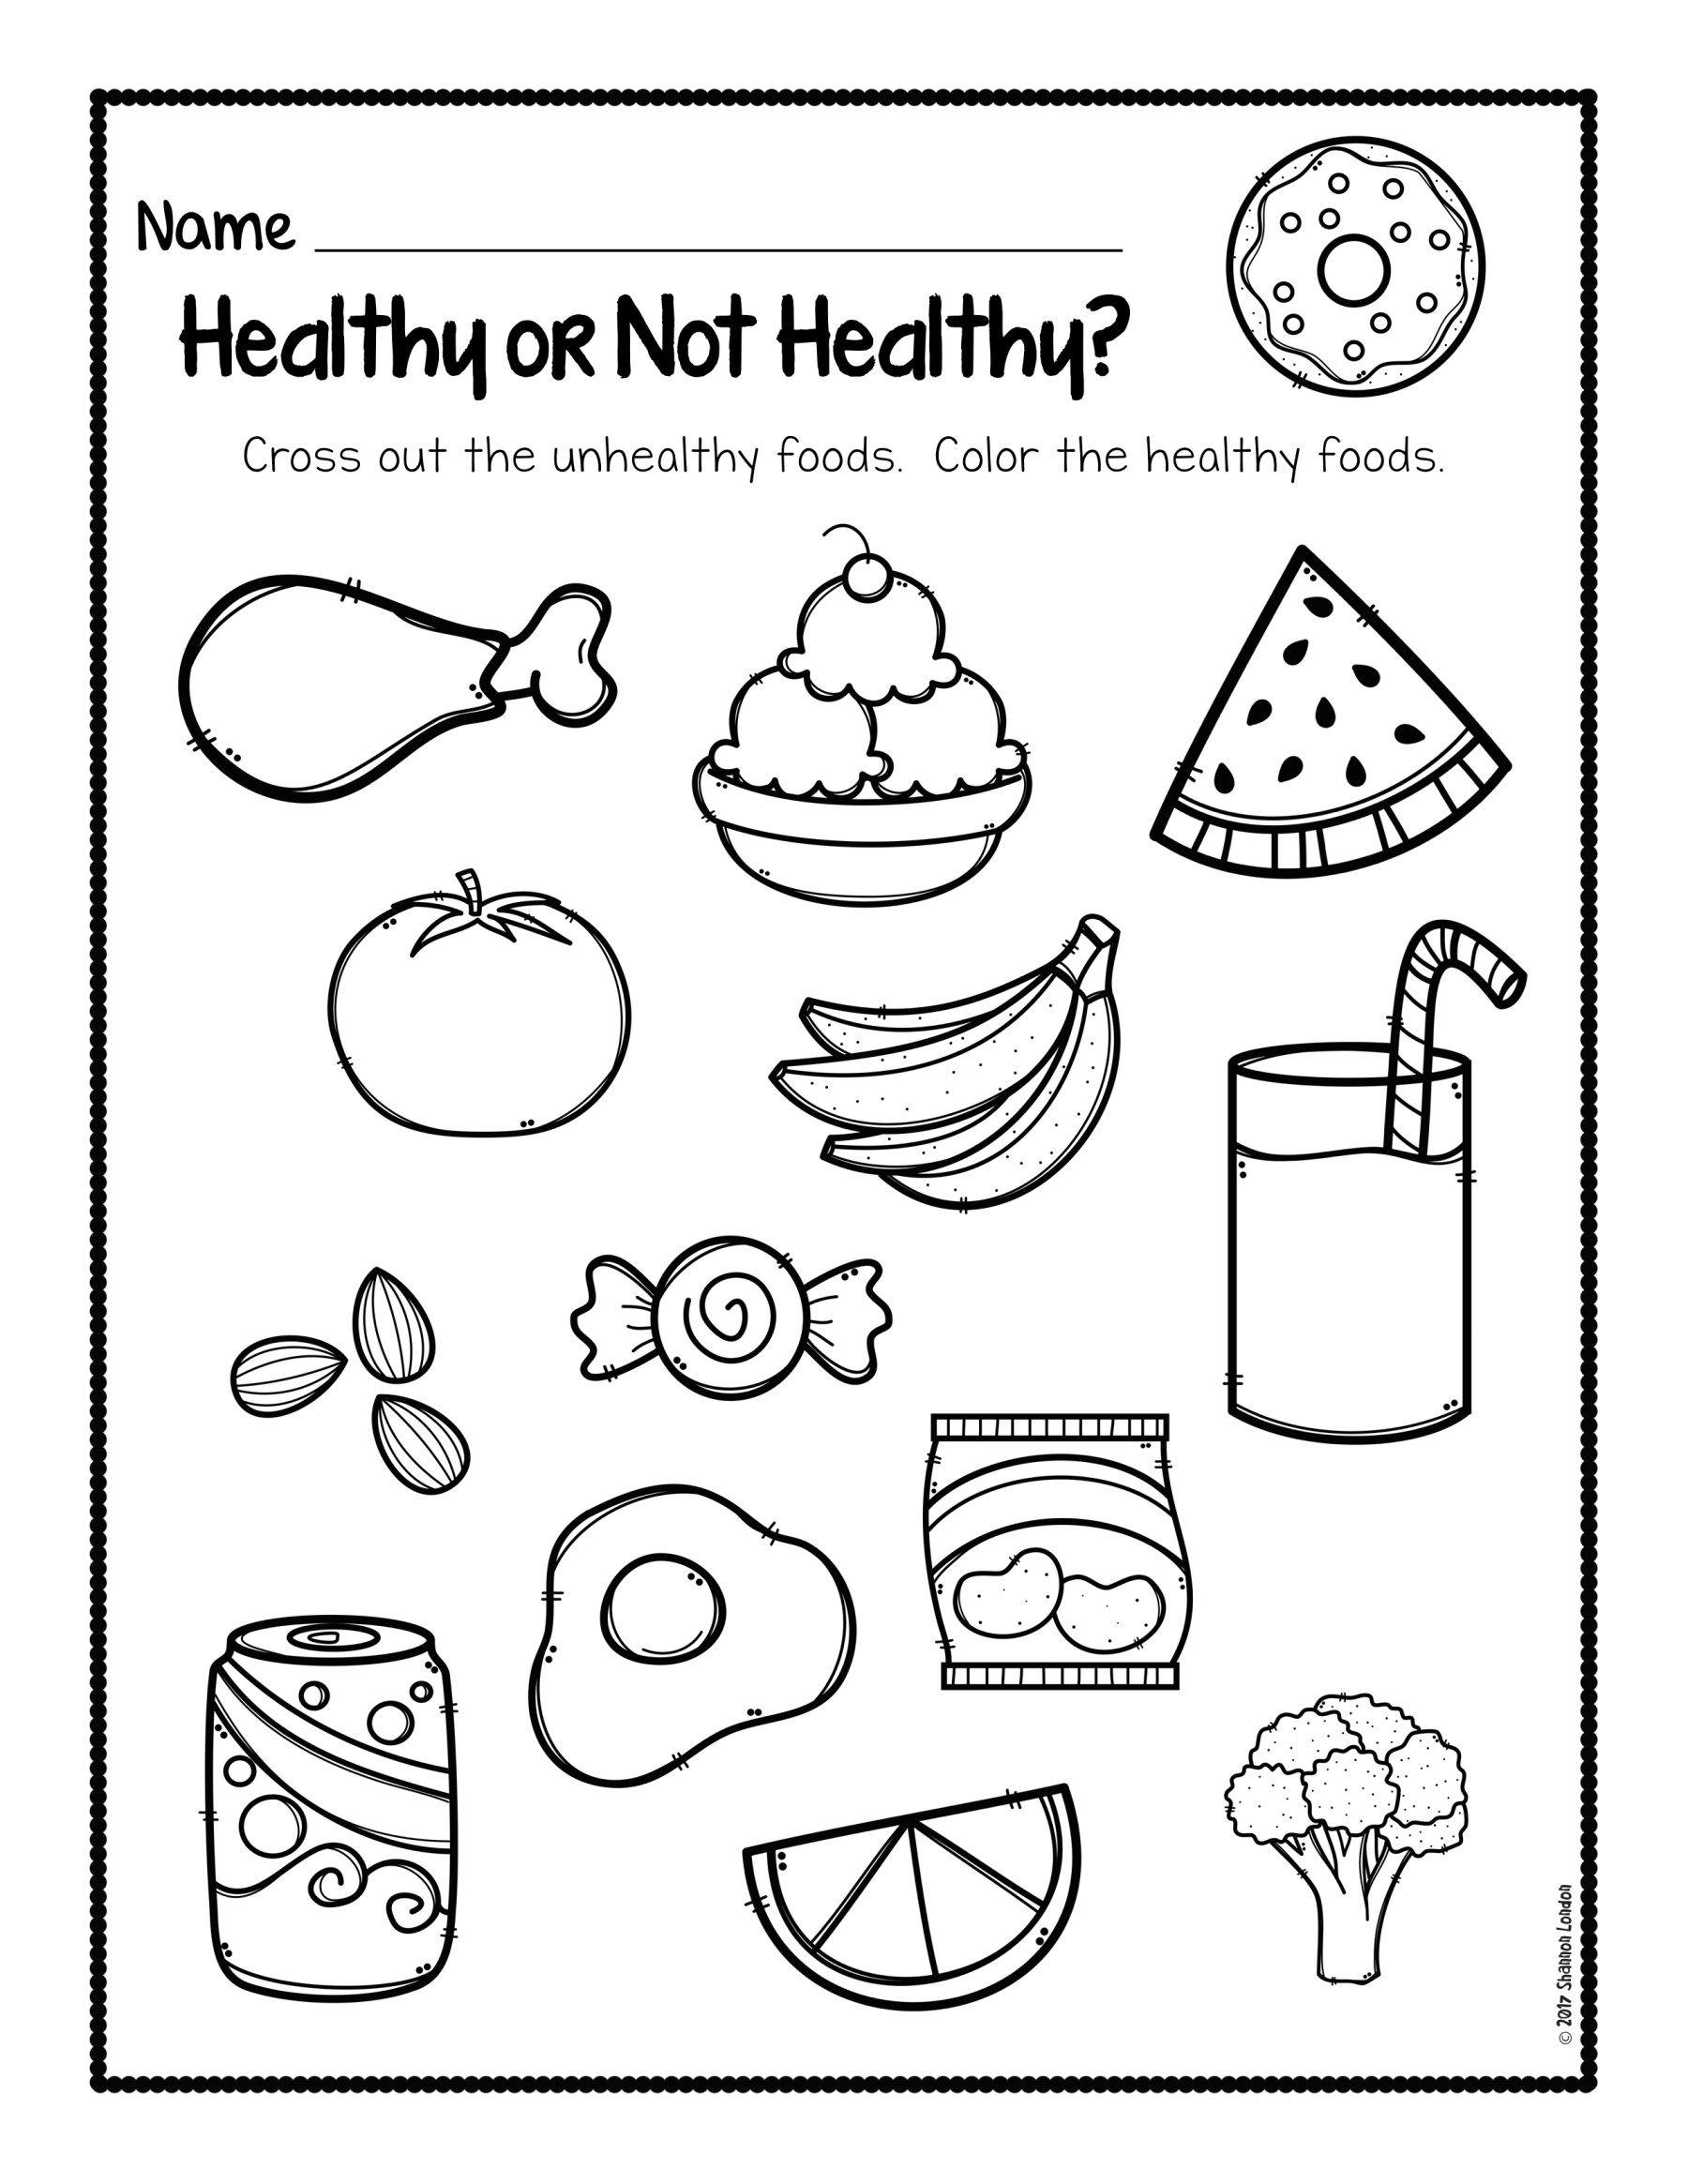 Healthy Foods Worksheet Free Download Newest Prints Pinterest